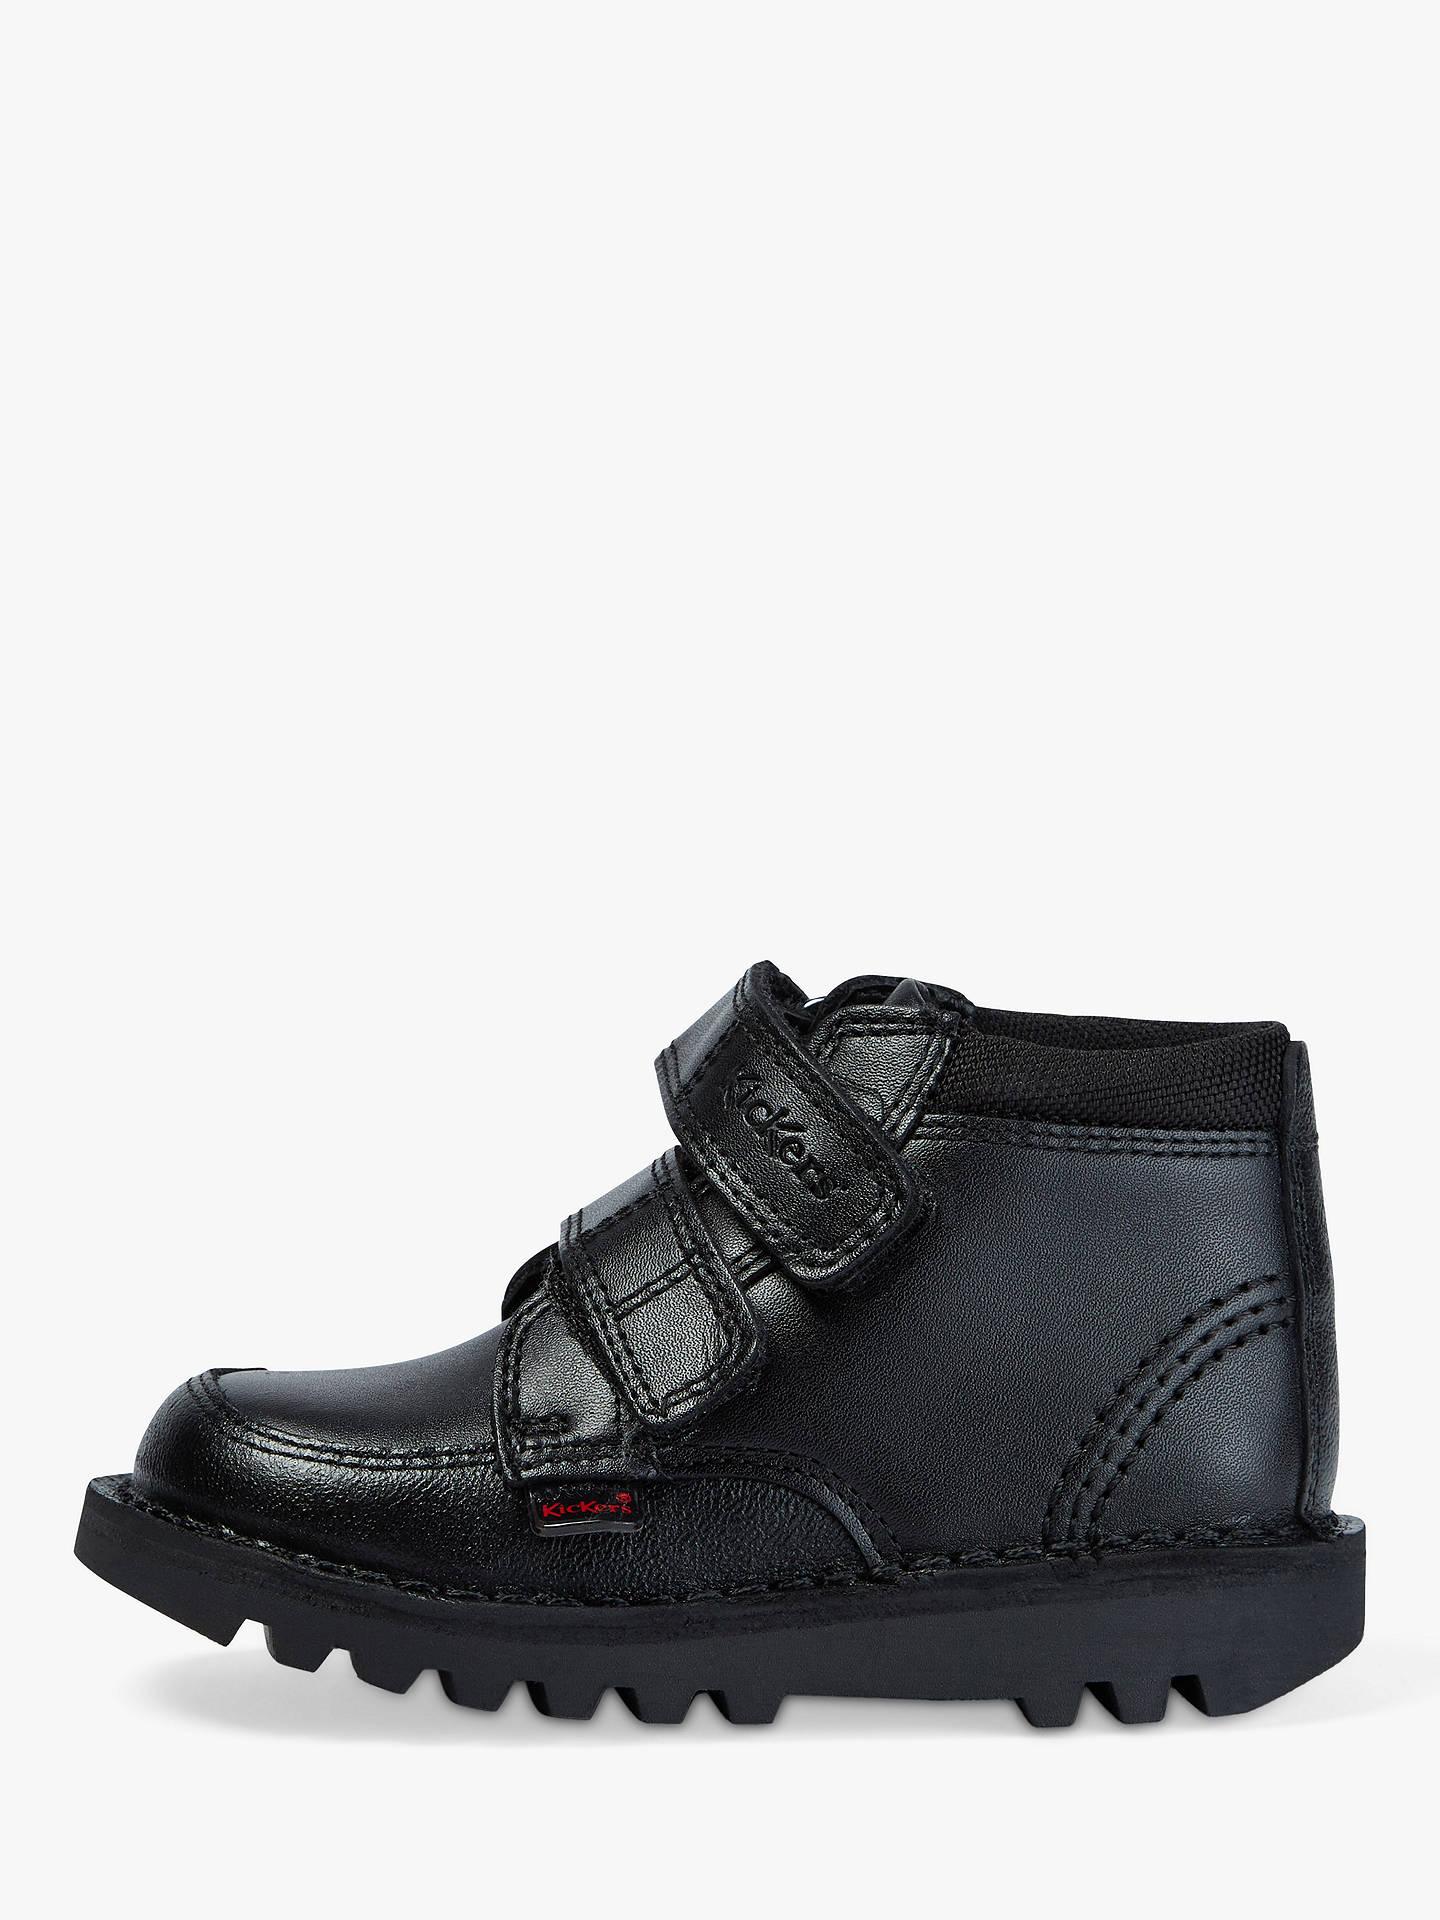 5bbbe653e Buy Kickers Children's Scuff Hi Shoes, Black, 25 Online at johnlewis.com